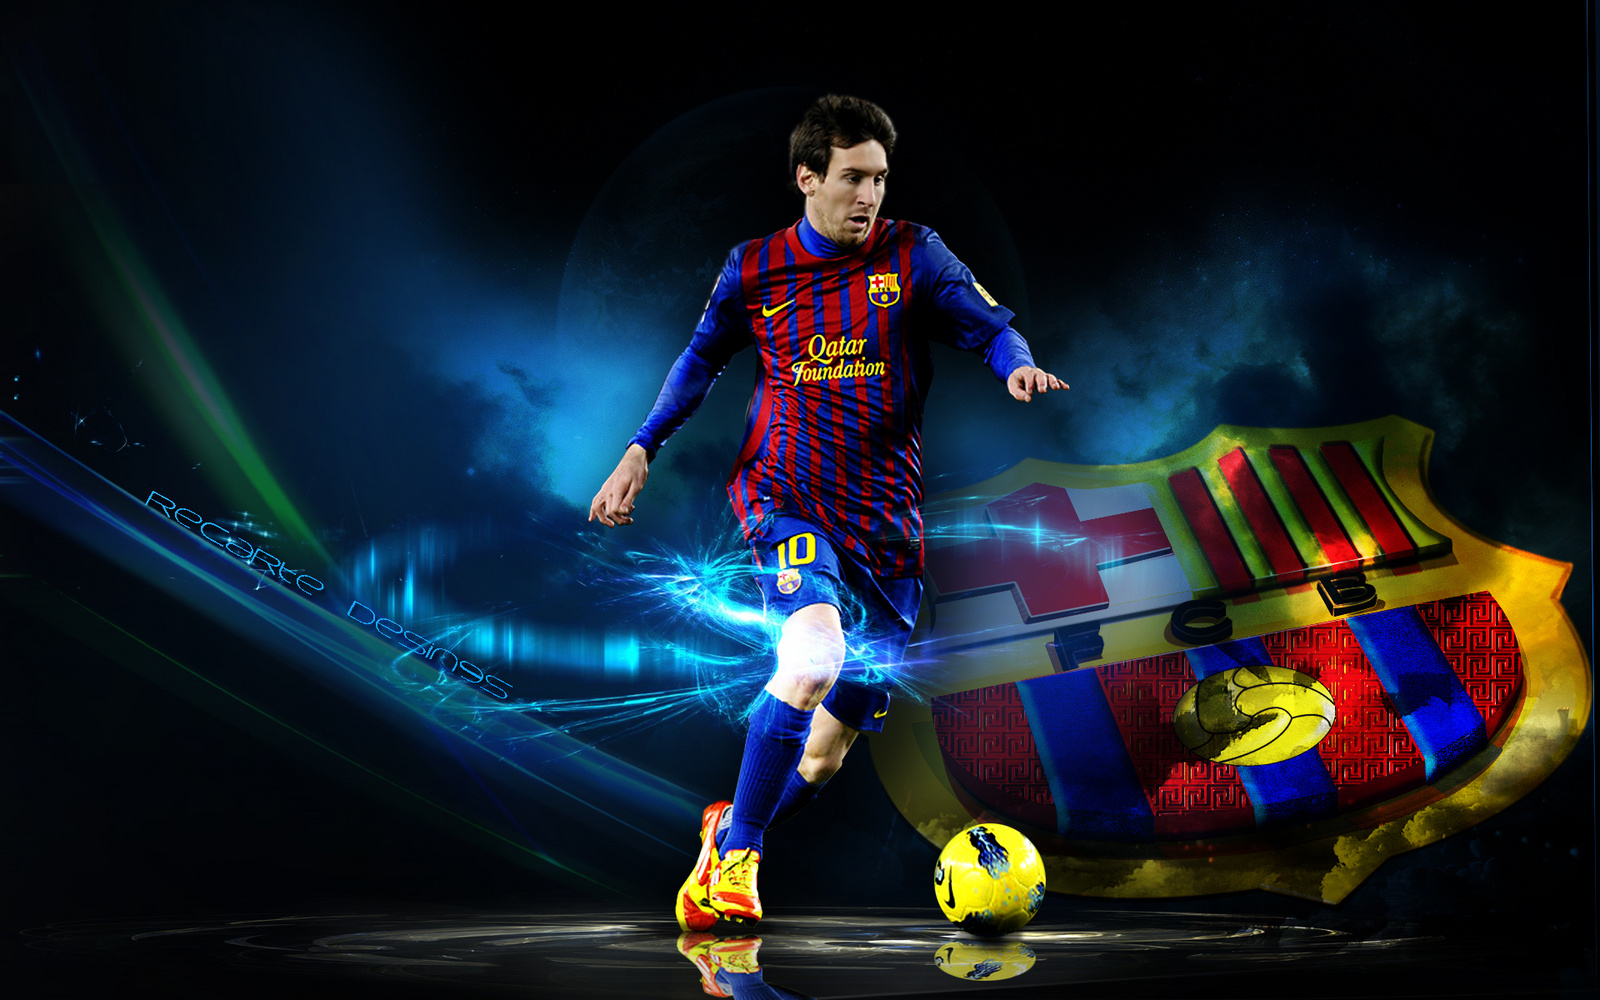 Messi Nike Football HD Desktop Wallpaper HD Desktop Wallpaper 1600x1000